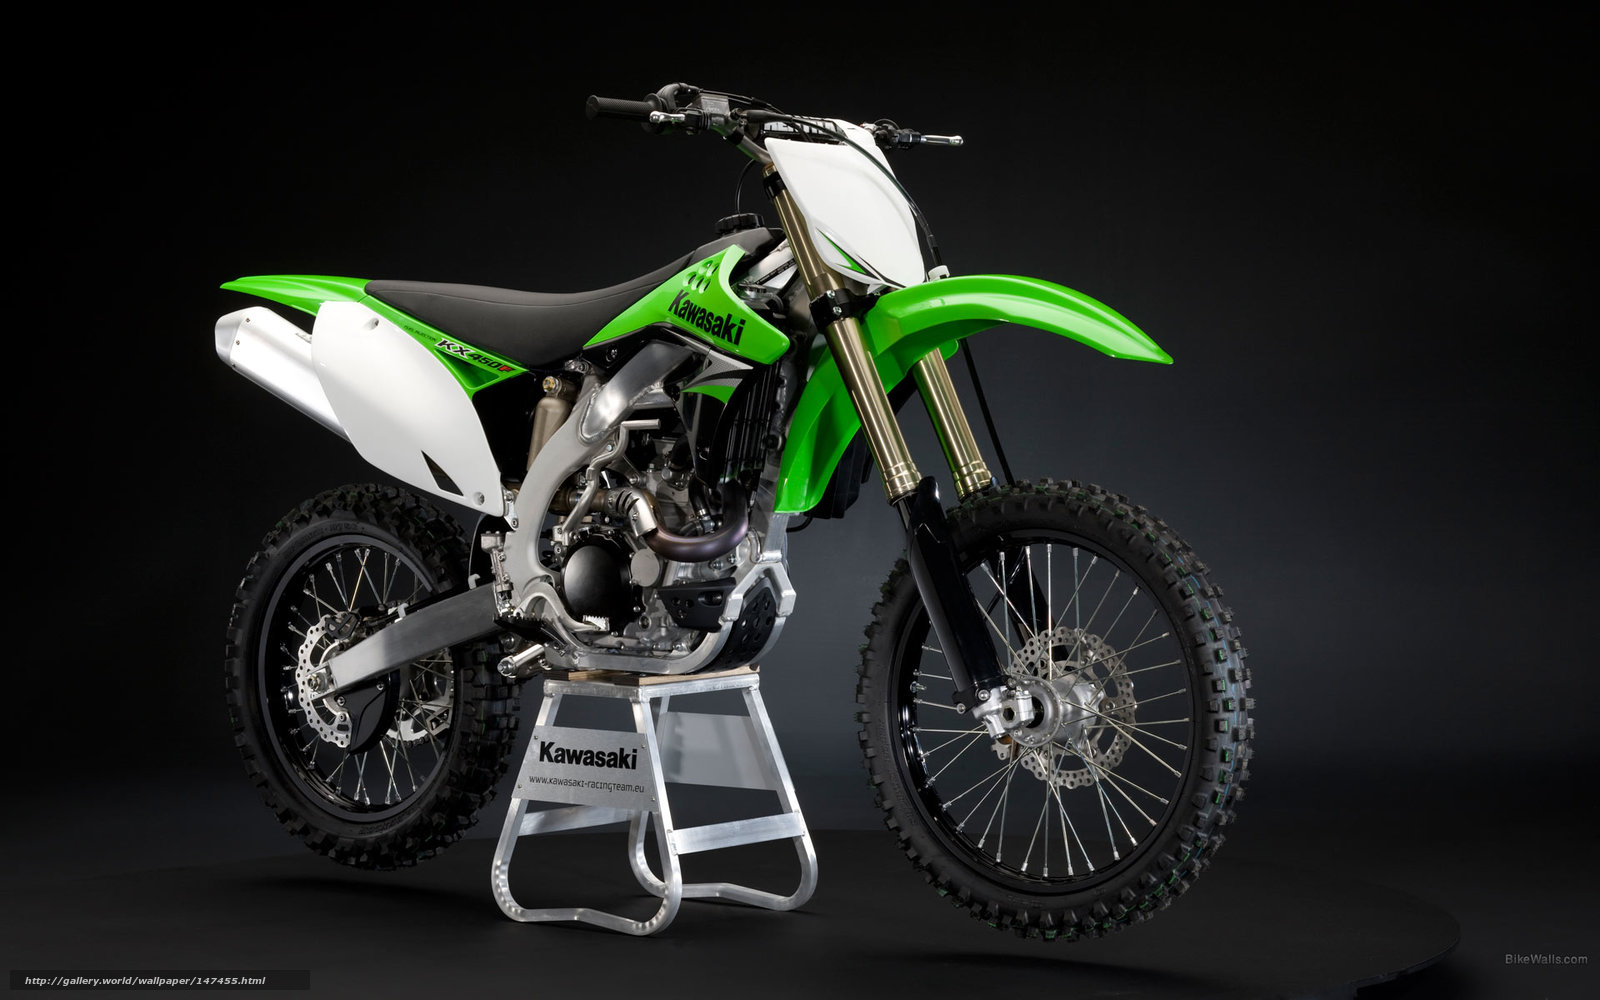 Tlcharger Fond D Ecran Kawasaki Motocross Kx450f Kx450f